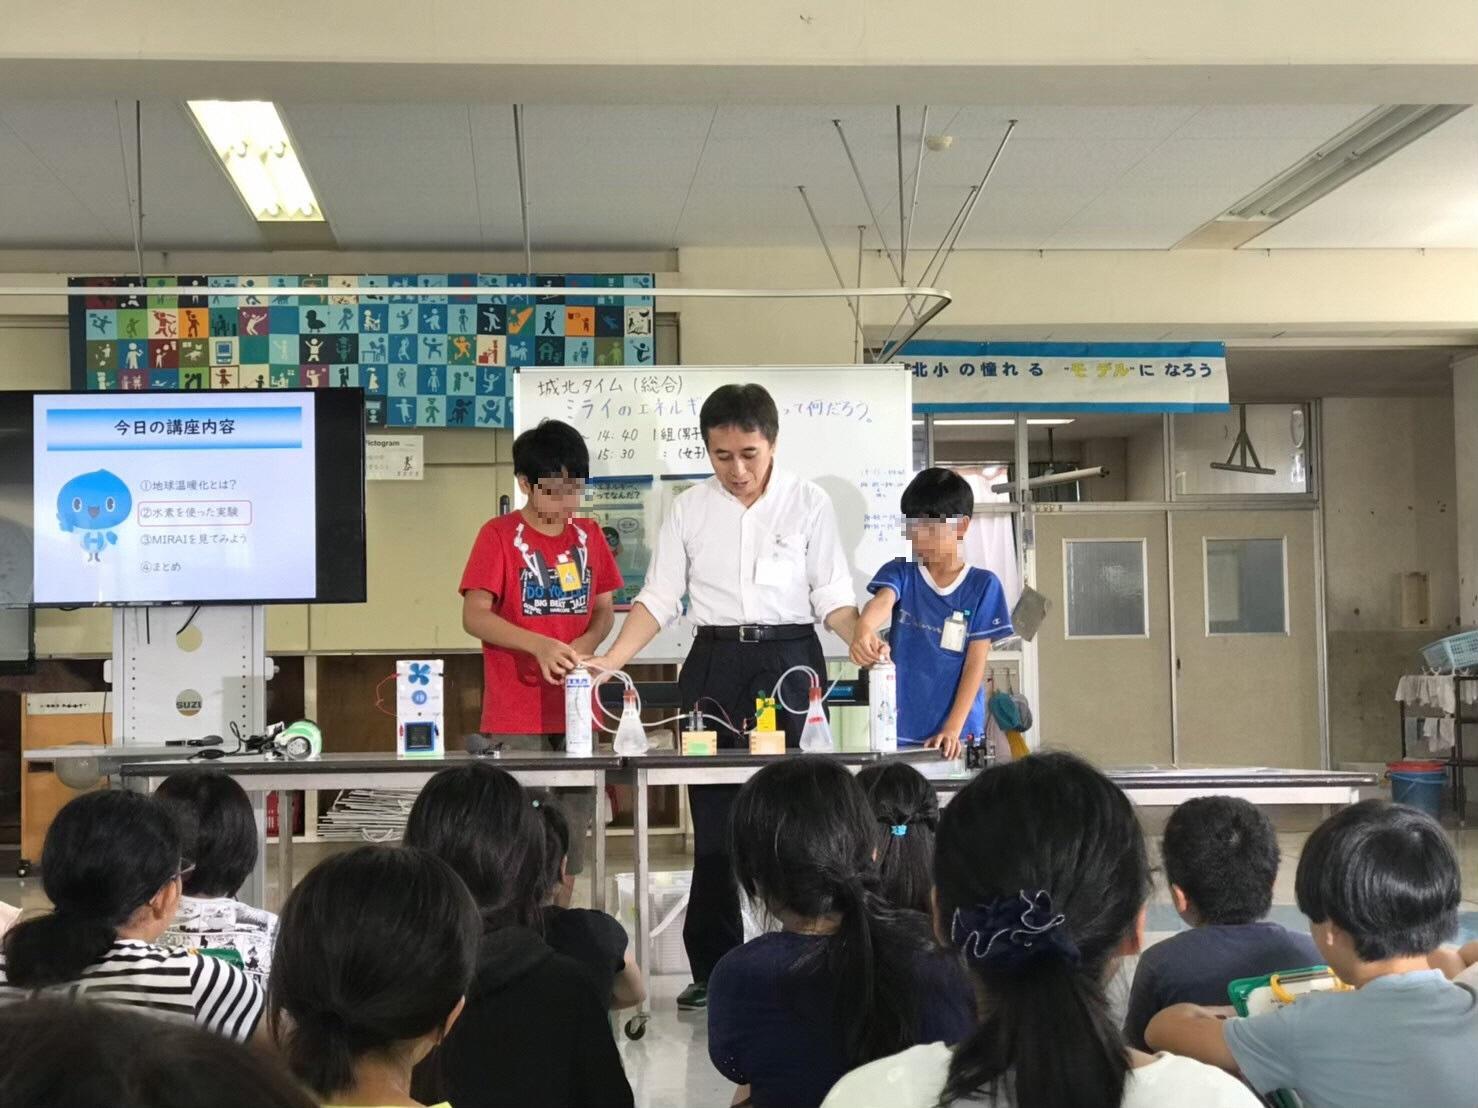 http://www.shizutan.jp/ondanka/event/2020/01/06/images/IMG-3974.JPG